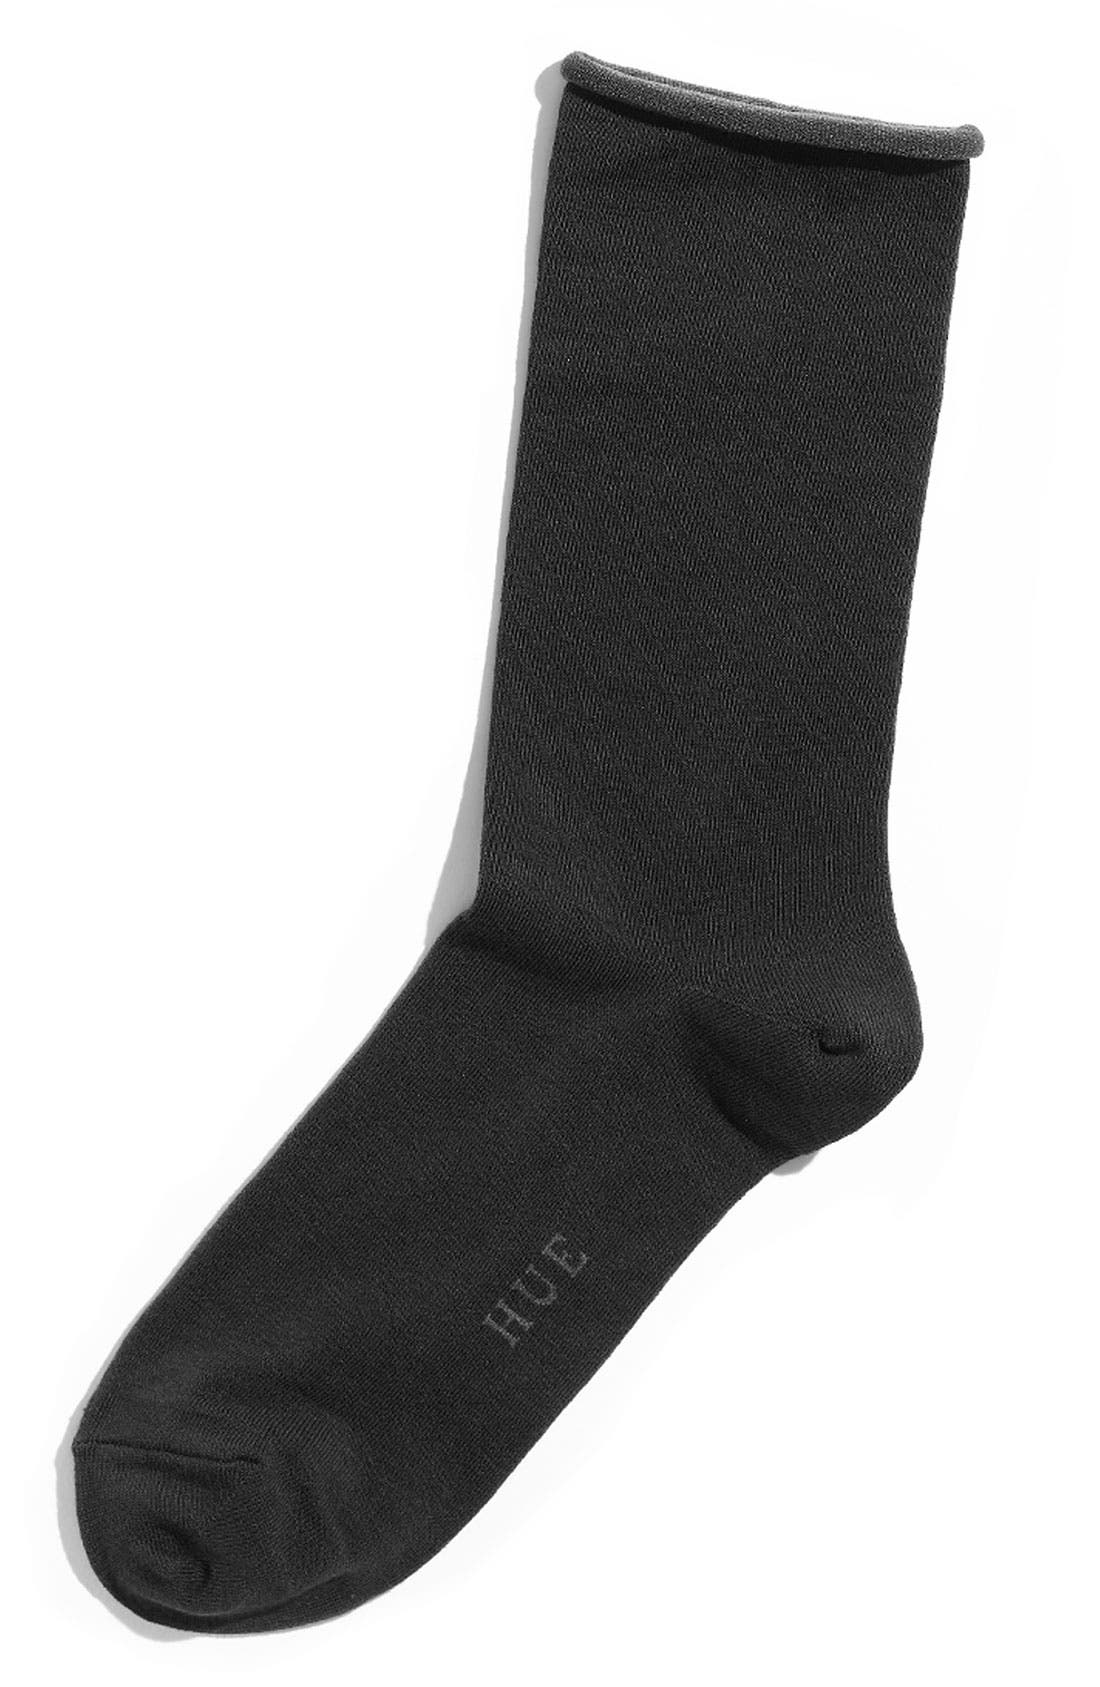 'Jeans' Socks,                             Main thumbnail 1, color,                             001